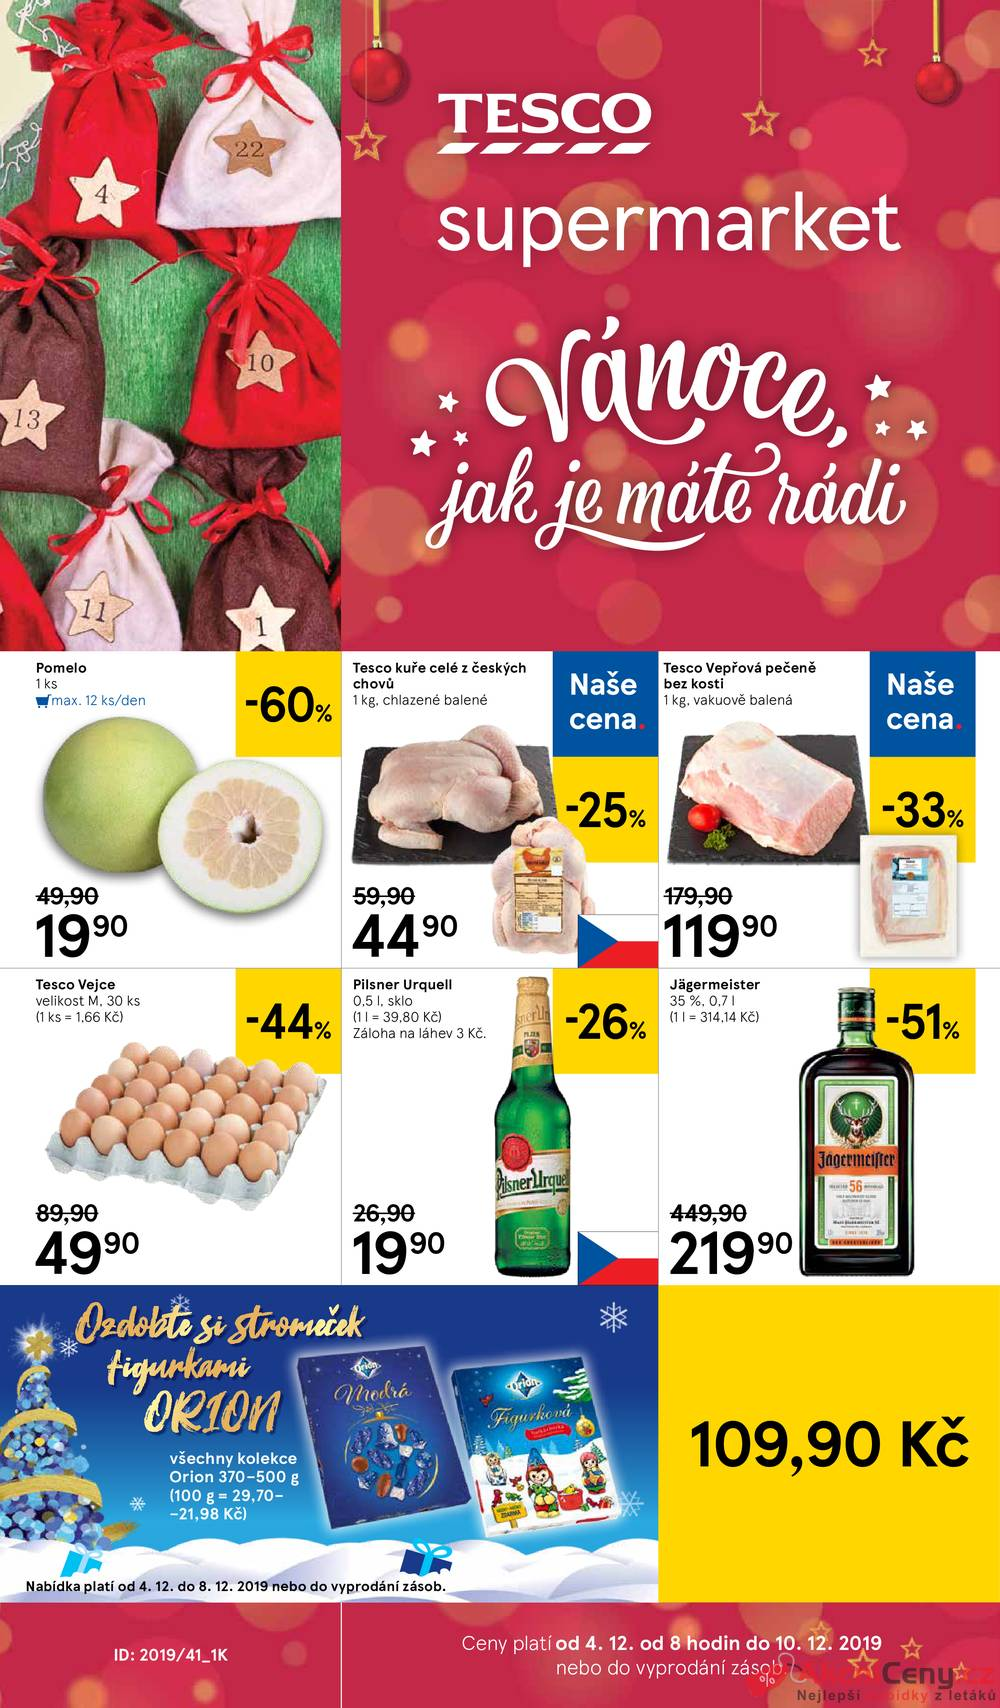 Leták Tesco - Tesco supermarkety od 4.12. do 10.12.2019 - strana 1